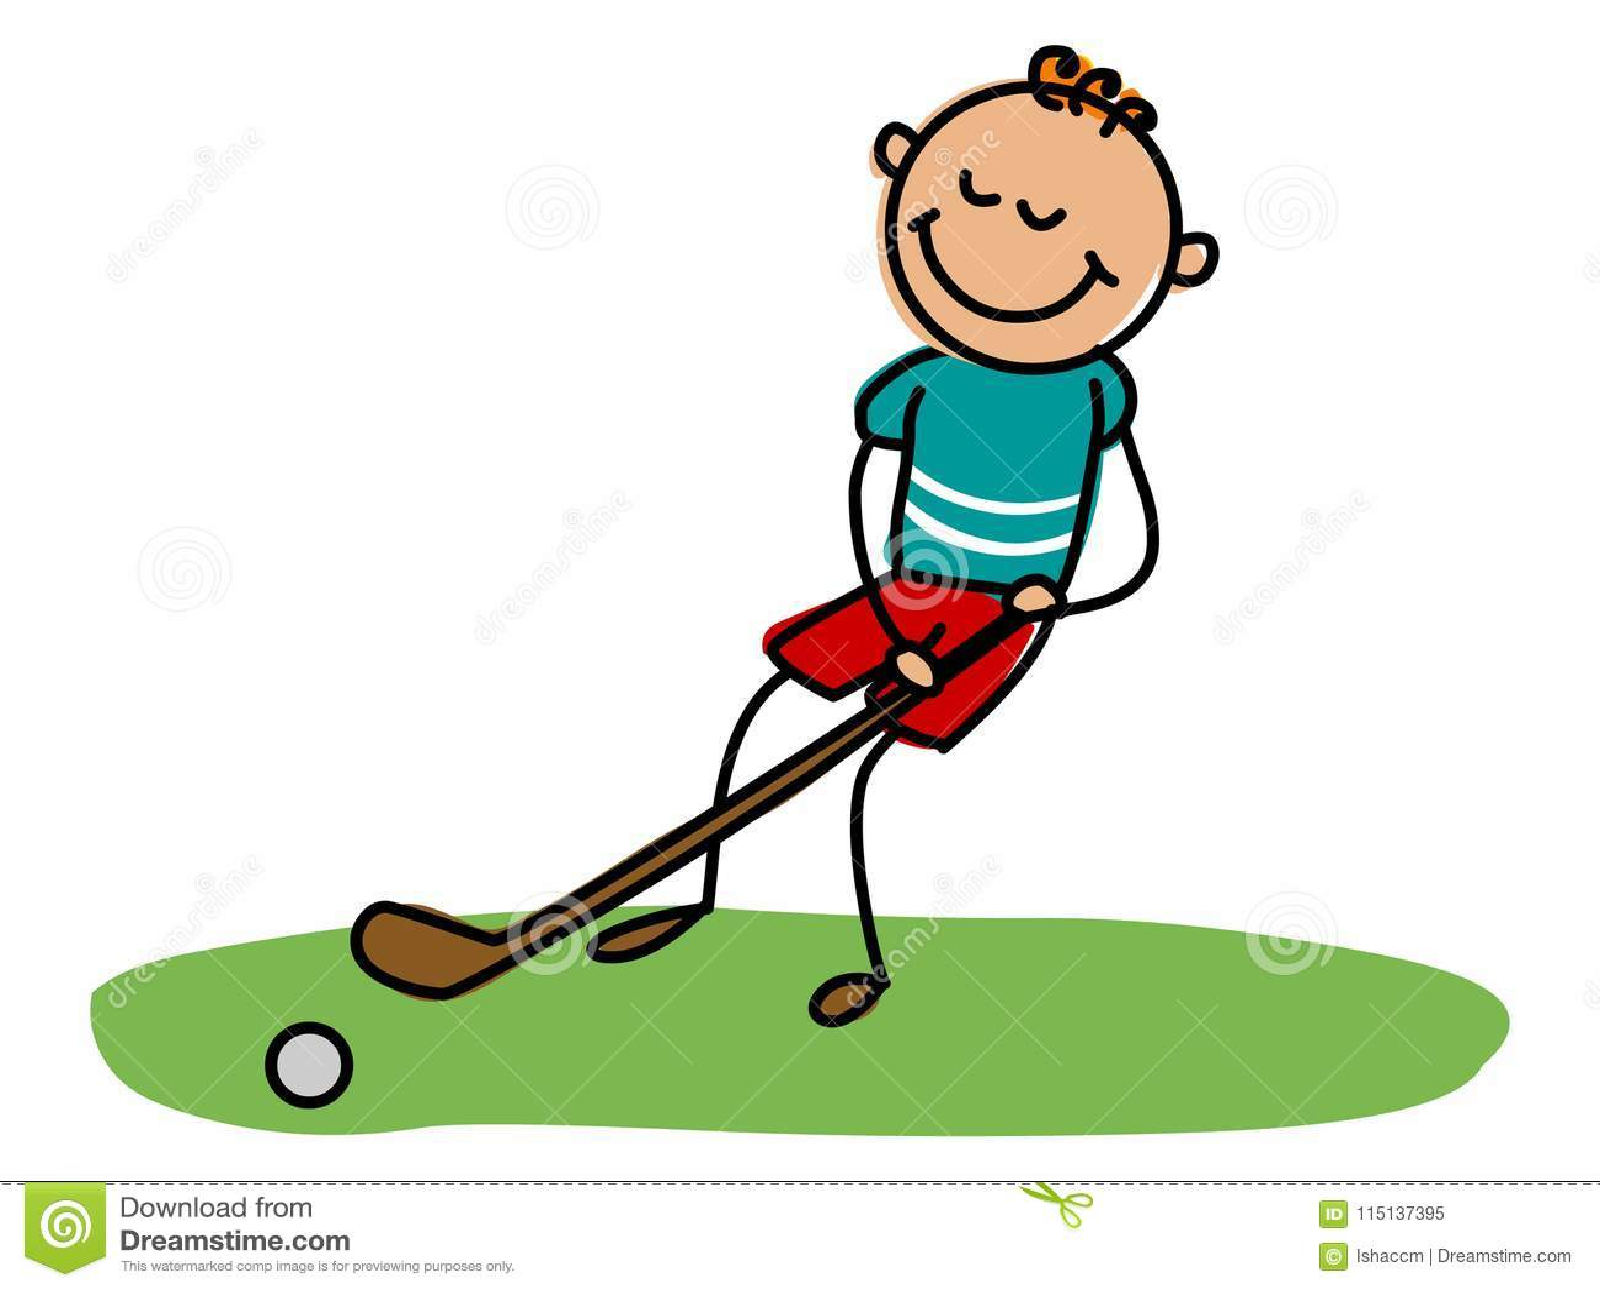 Hockey Kid Cartoon Kid Vector Illustration Stock Vector Illustration Of Illustration Artistic 115137395